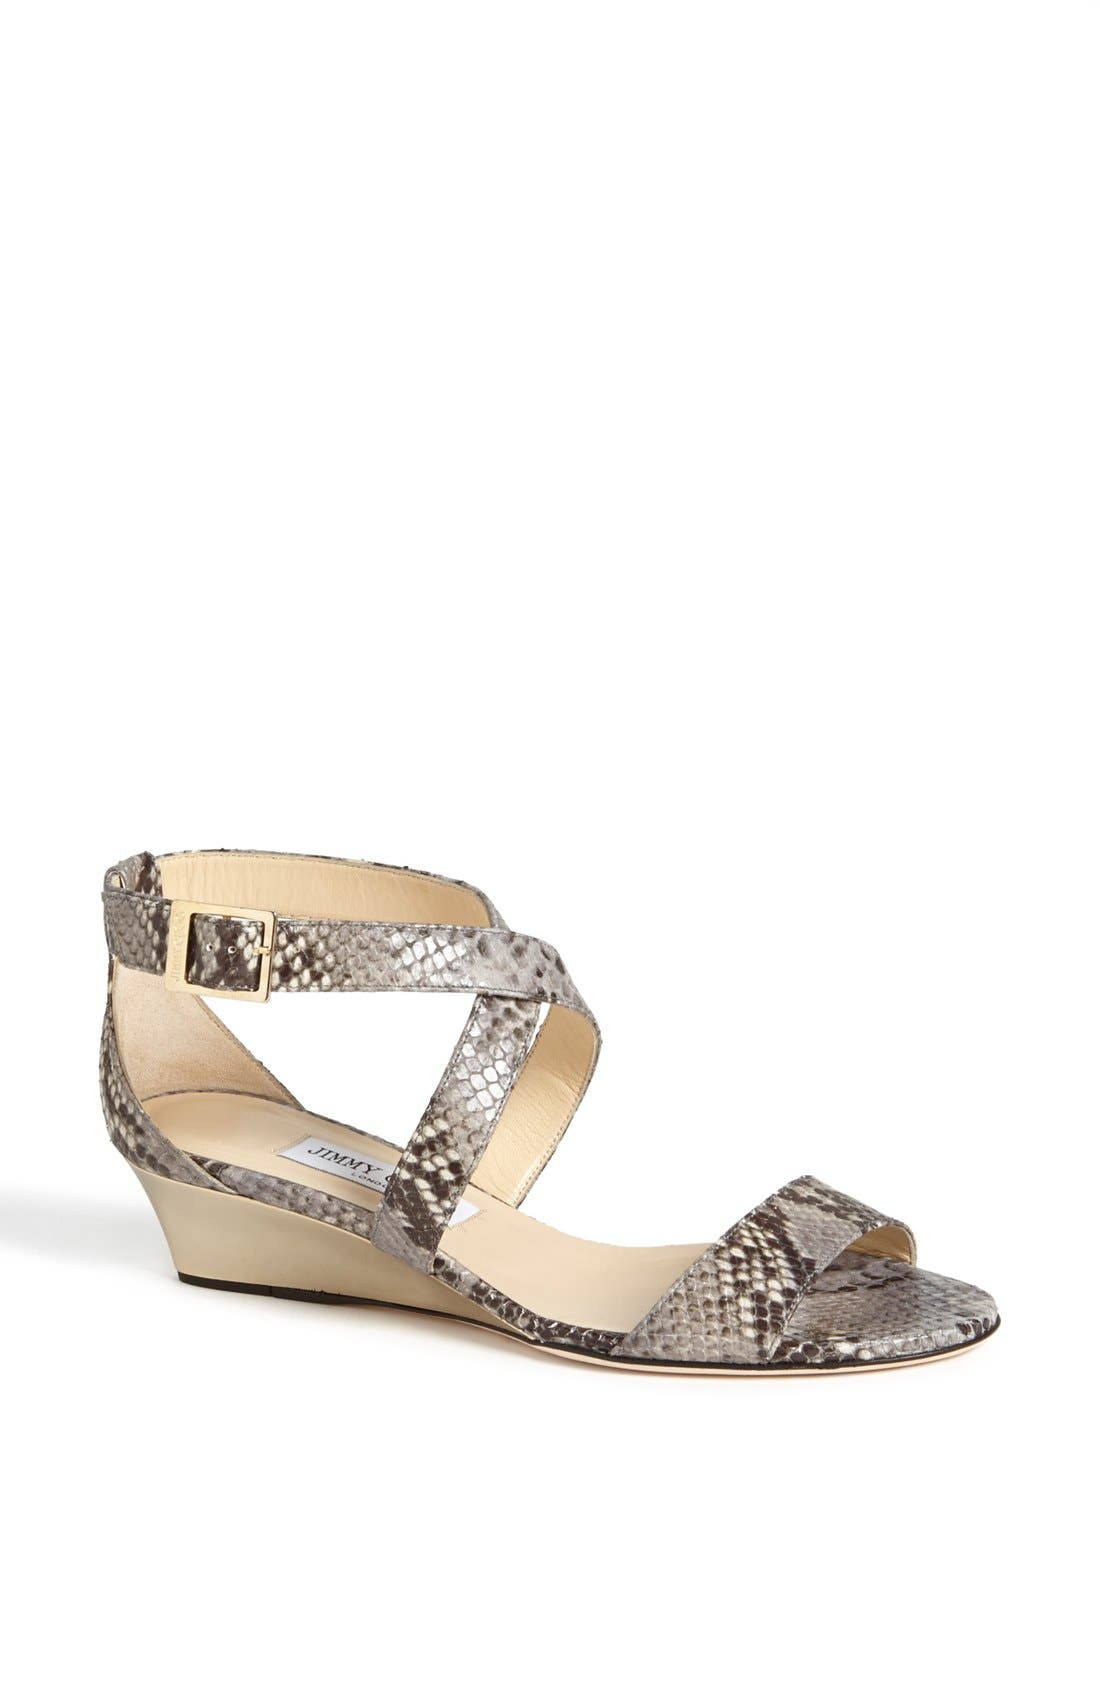 Alternate Image 1 Selected - Jimmy Choo 'Chiara' Wedge Sandal